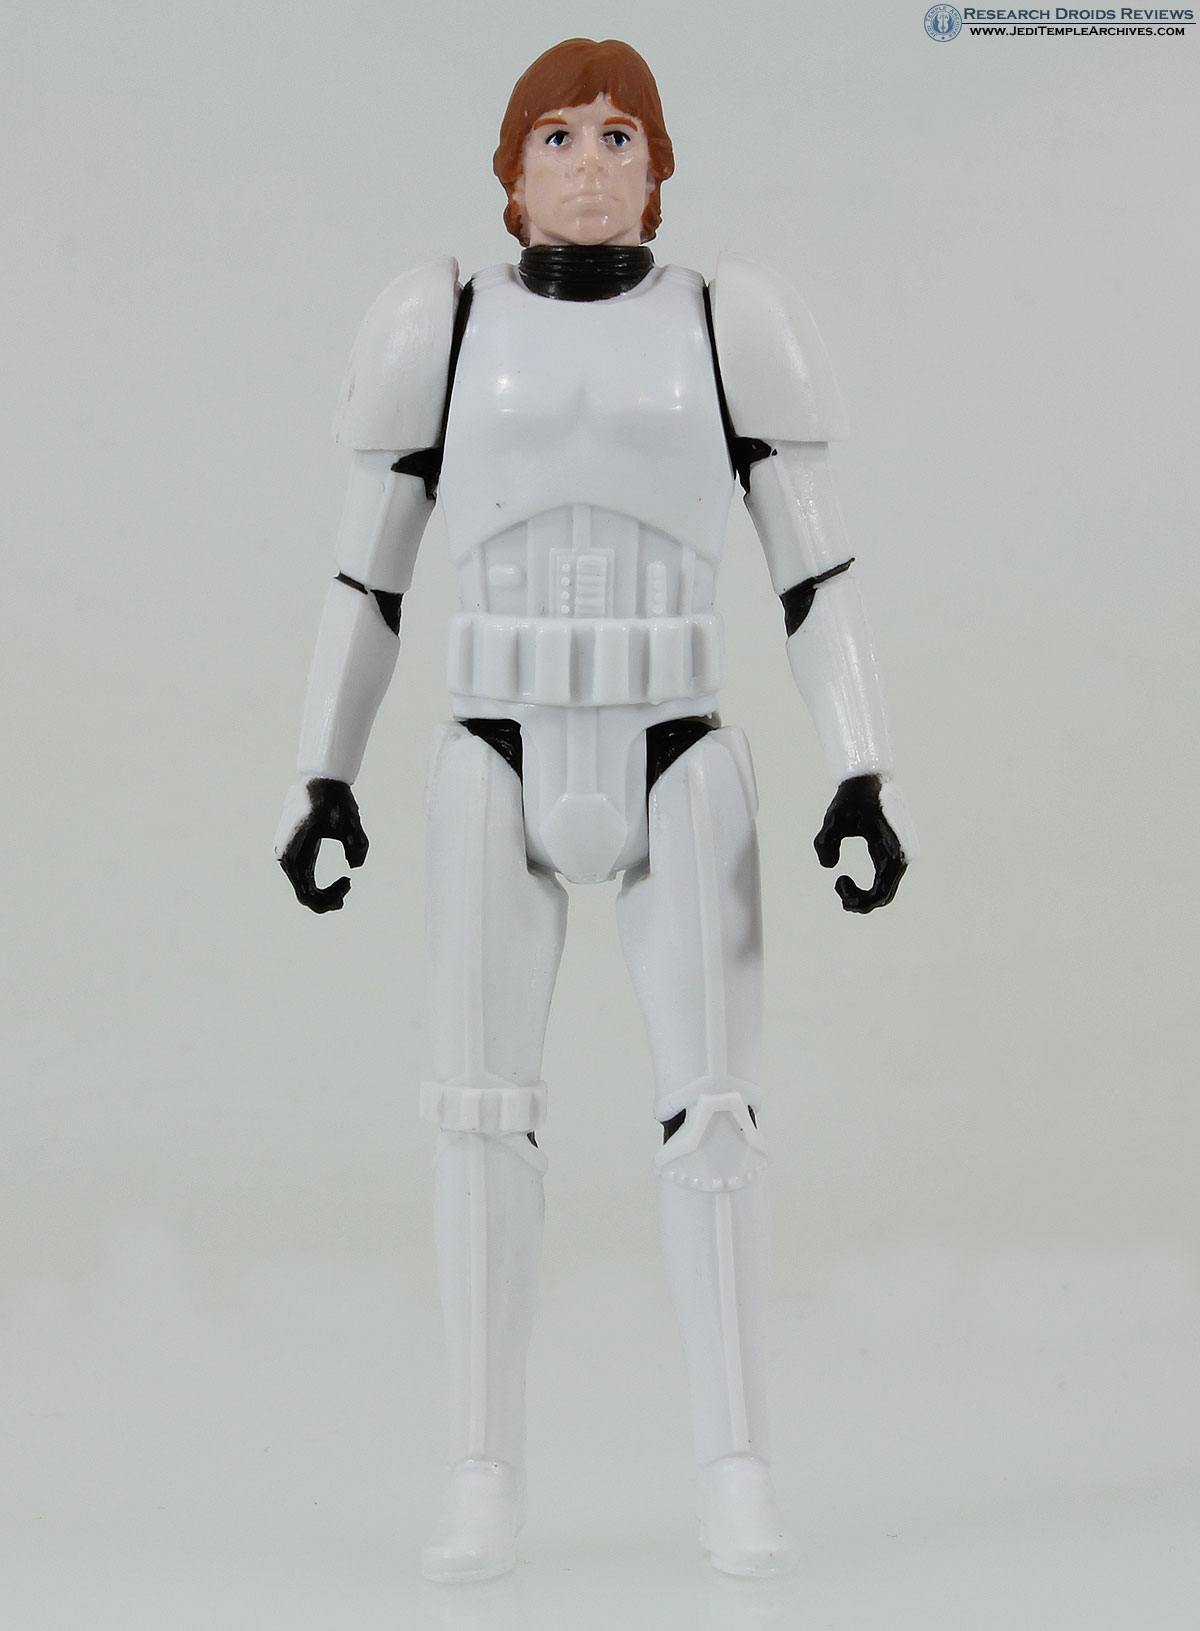 Luke Skywalker | Princess Leia and Luke Skywalker Stormtrooper Disguise